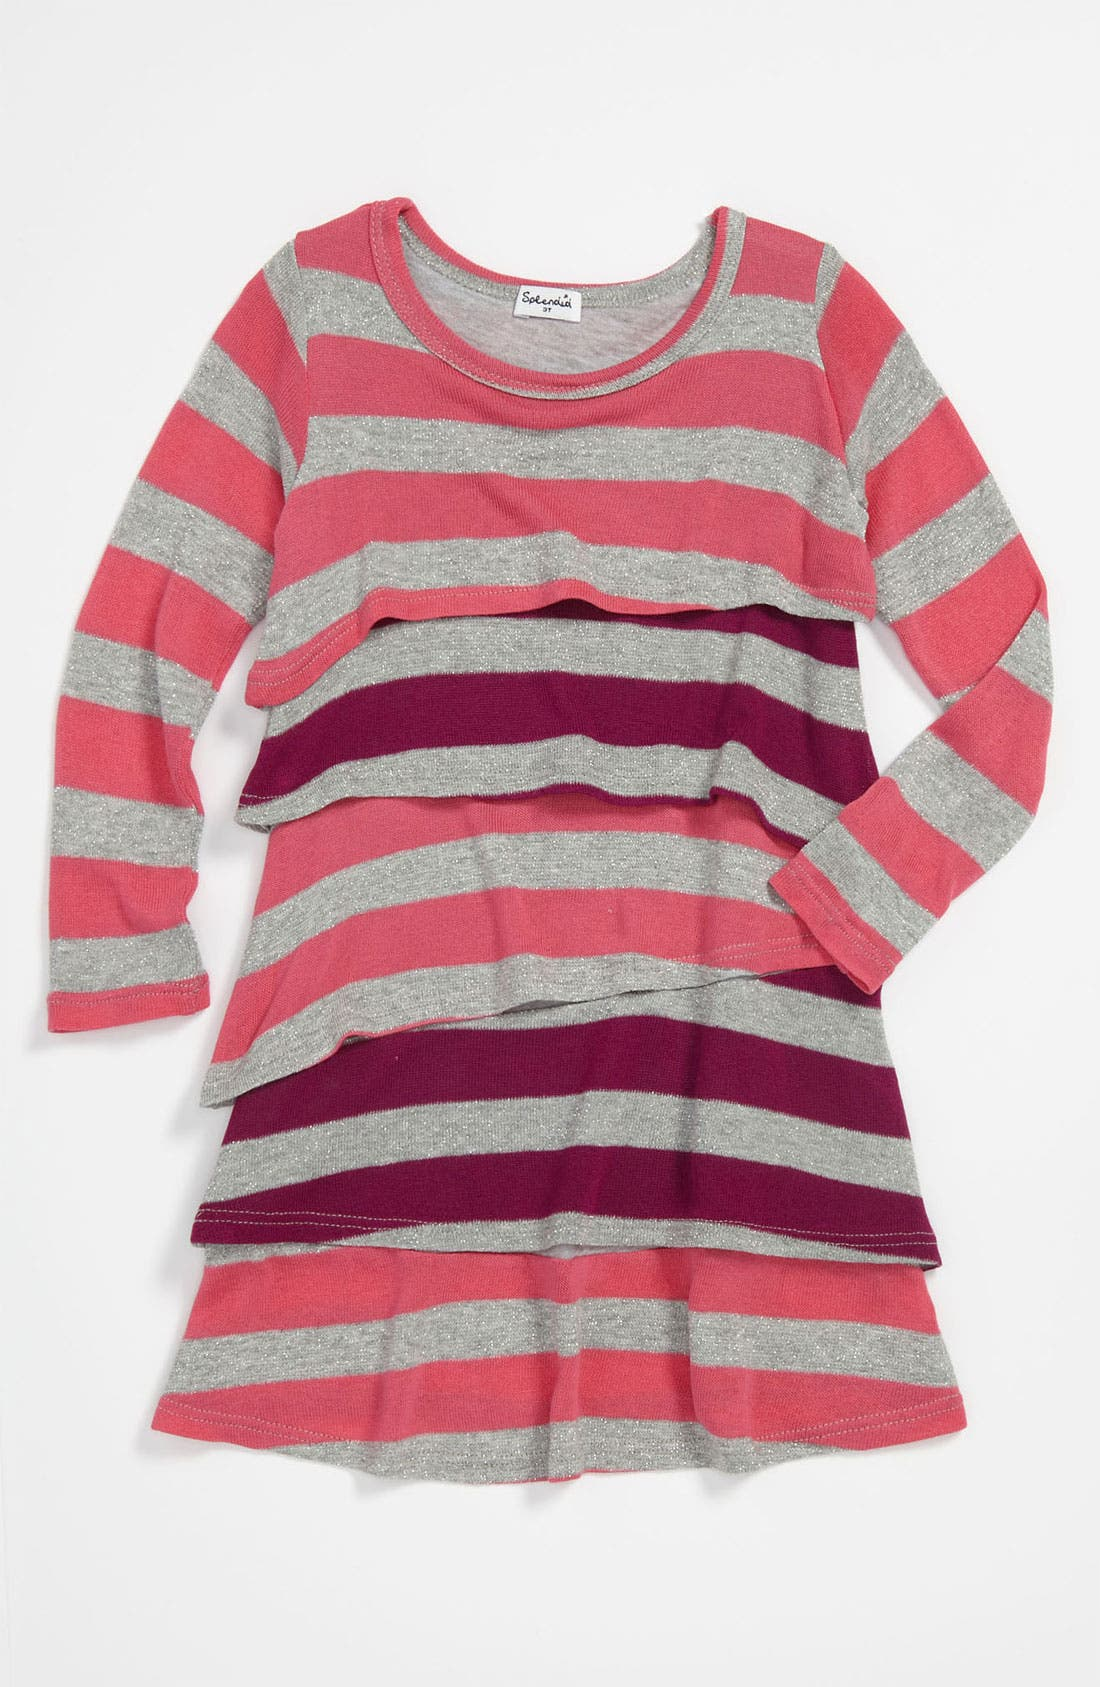 Main Image - Splendid 'Platinum' Stripe Dress (Toddler)